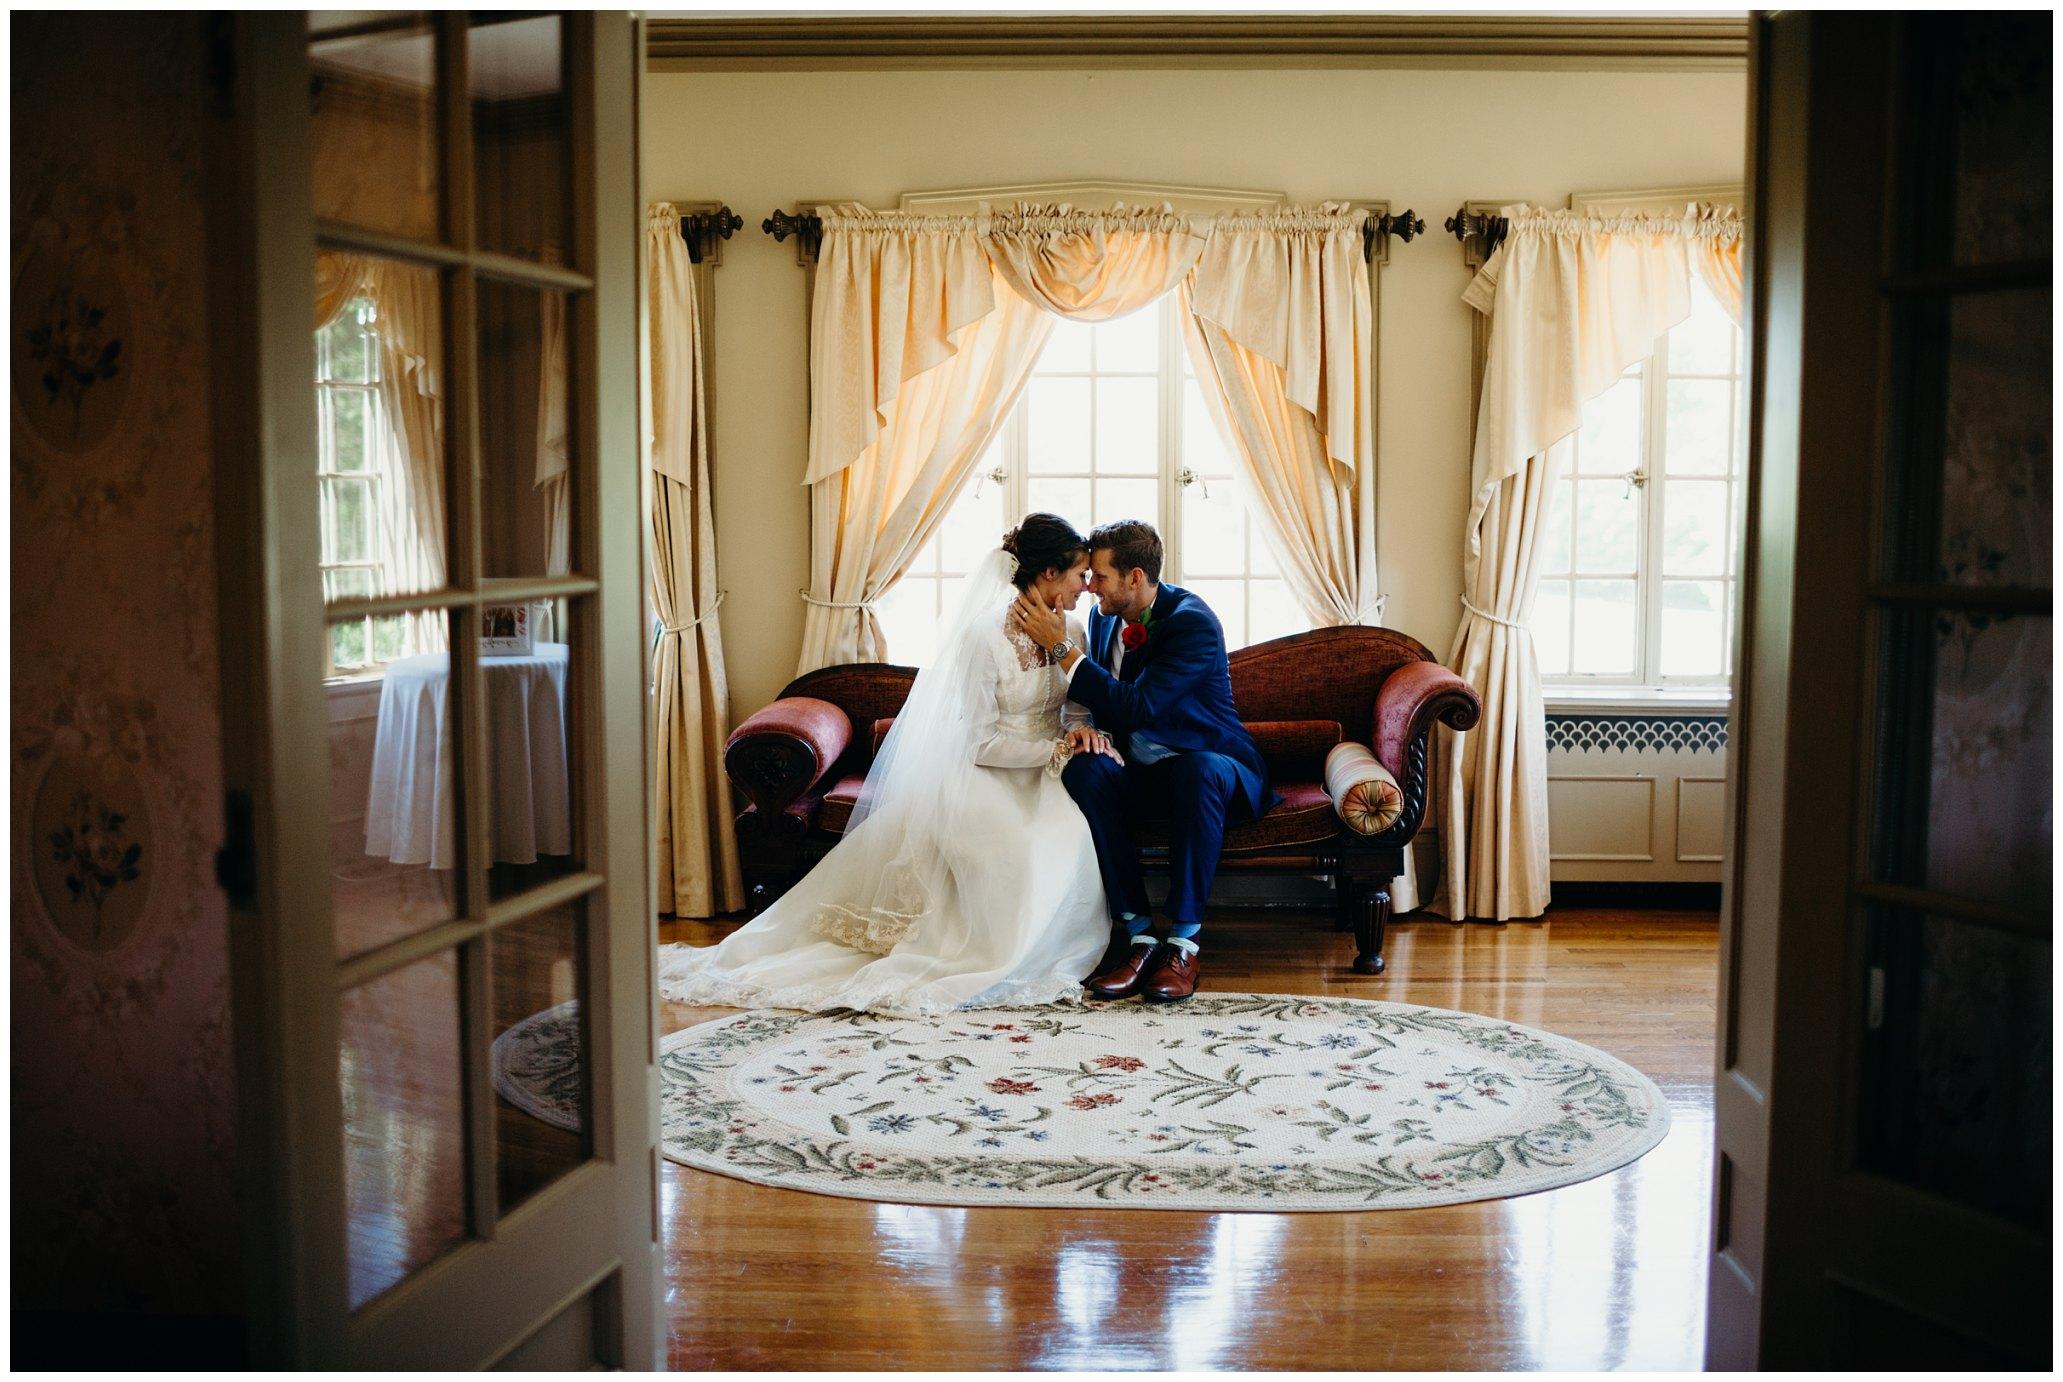 Bride and groom at felt mansion